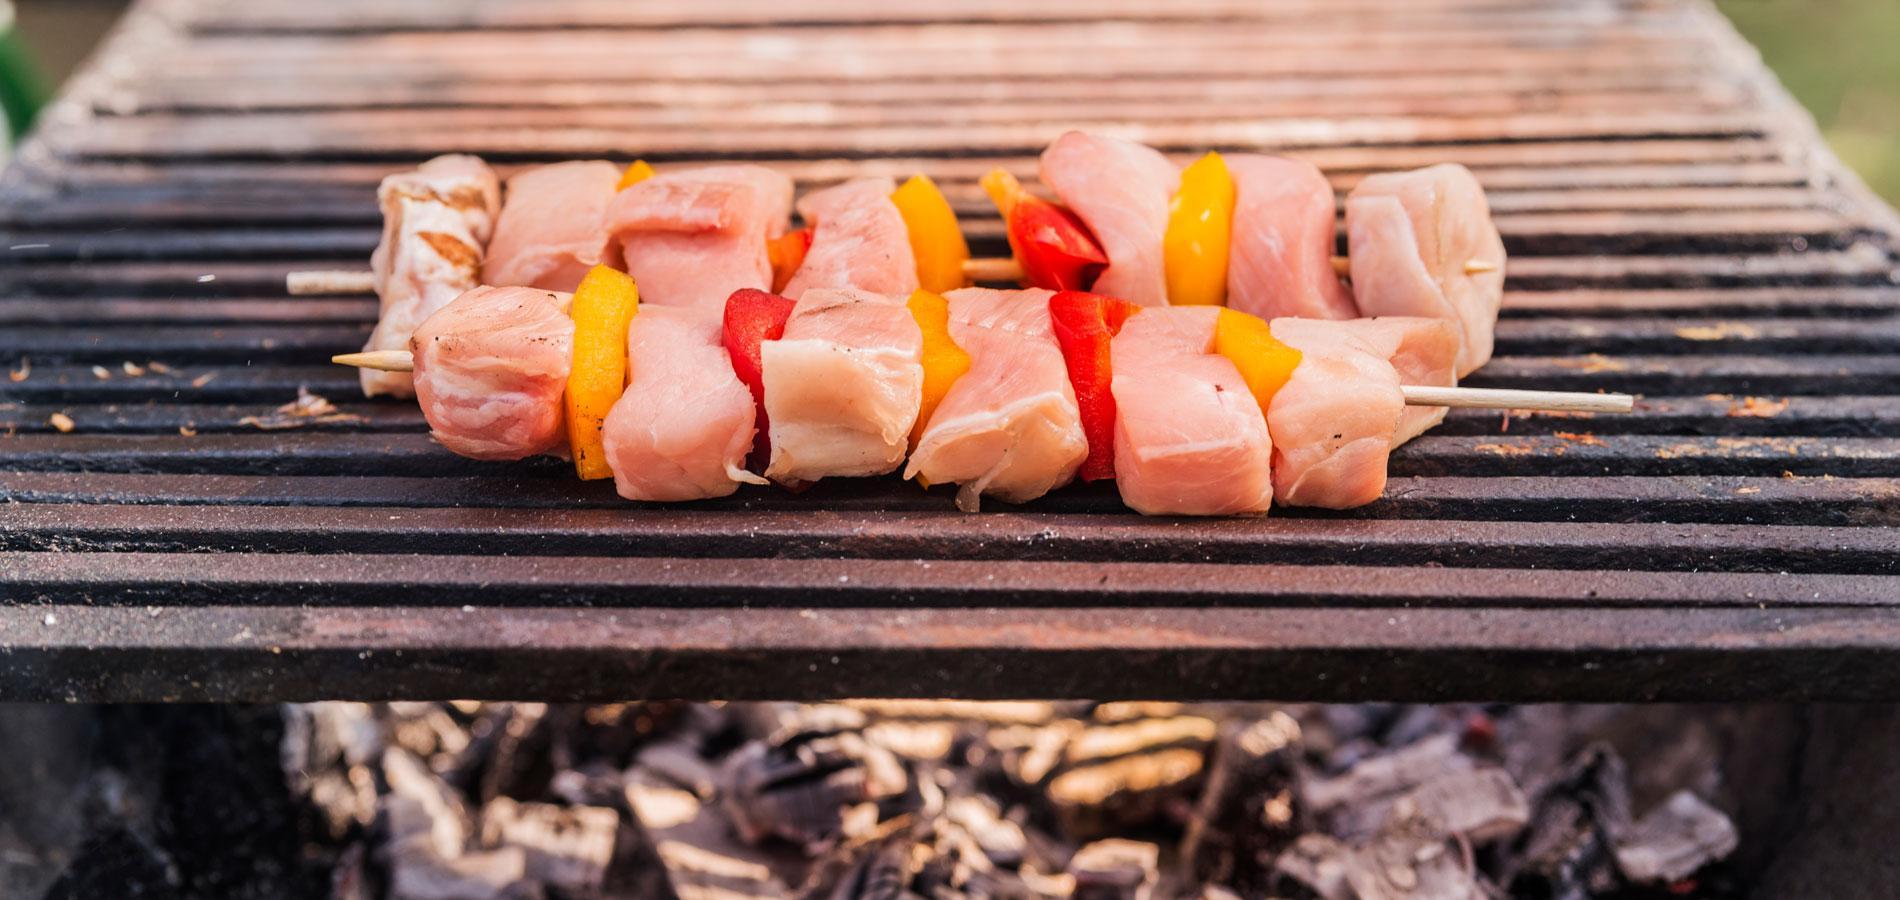 Trois m thodes pour r ussir l allumage de son barbecue du for Comment allumer un barbecue